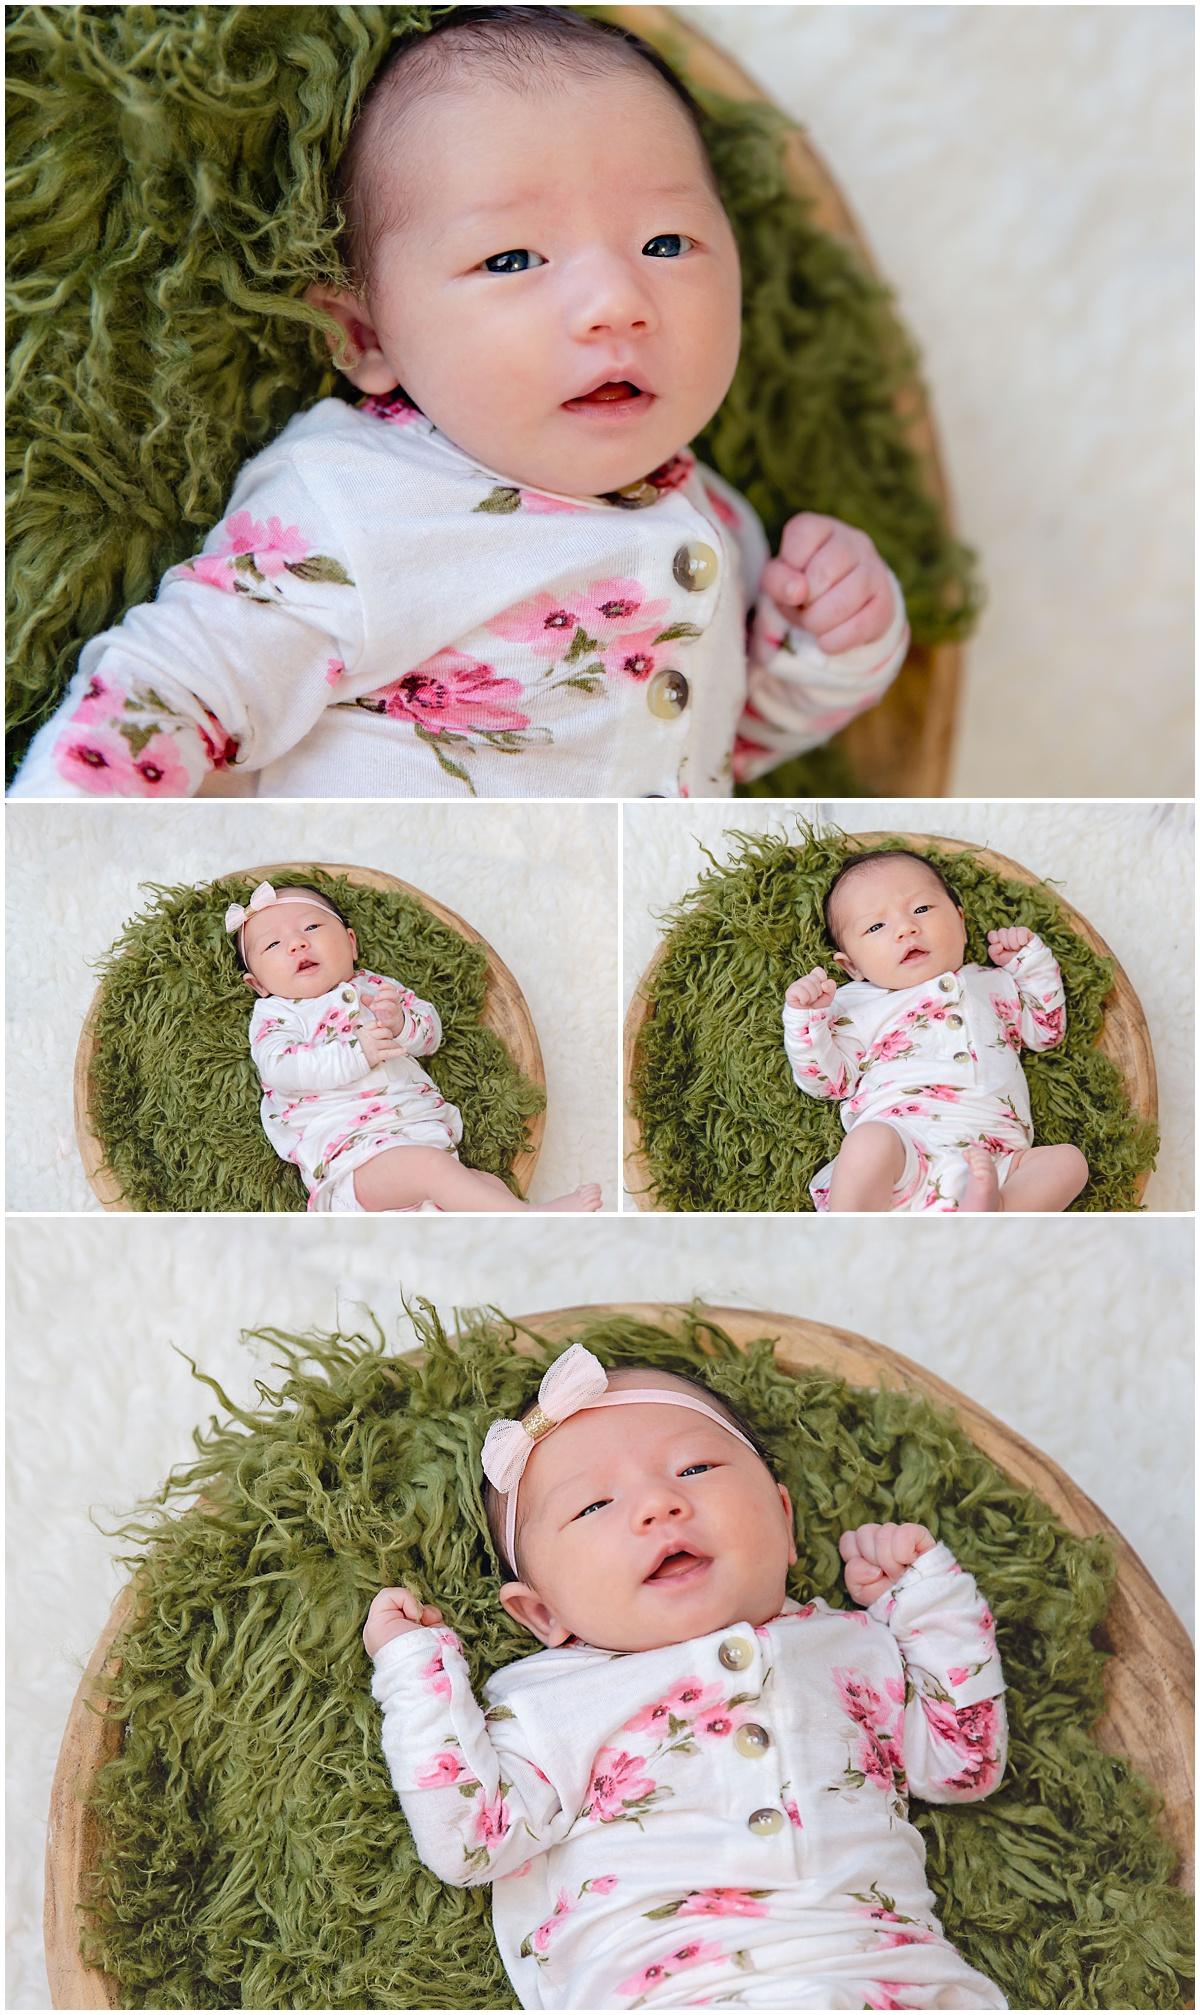 Lifestyle-newborn-family-photos-san-antonio-texas-carly-barton-photography_0011.jpg